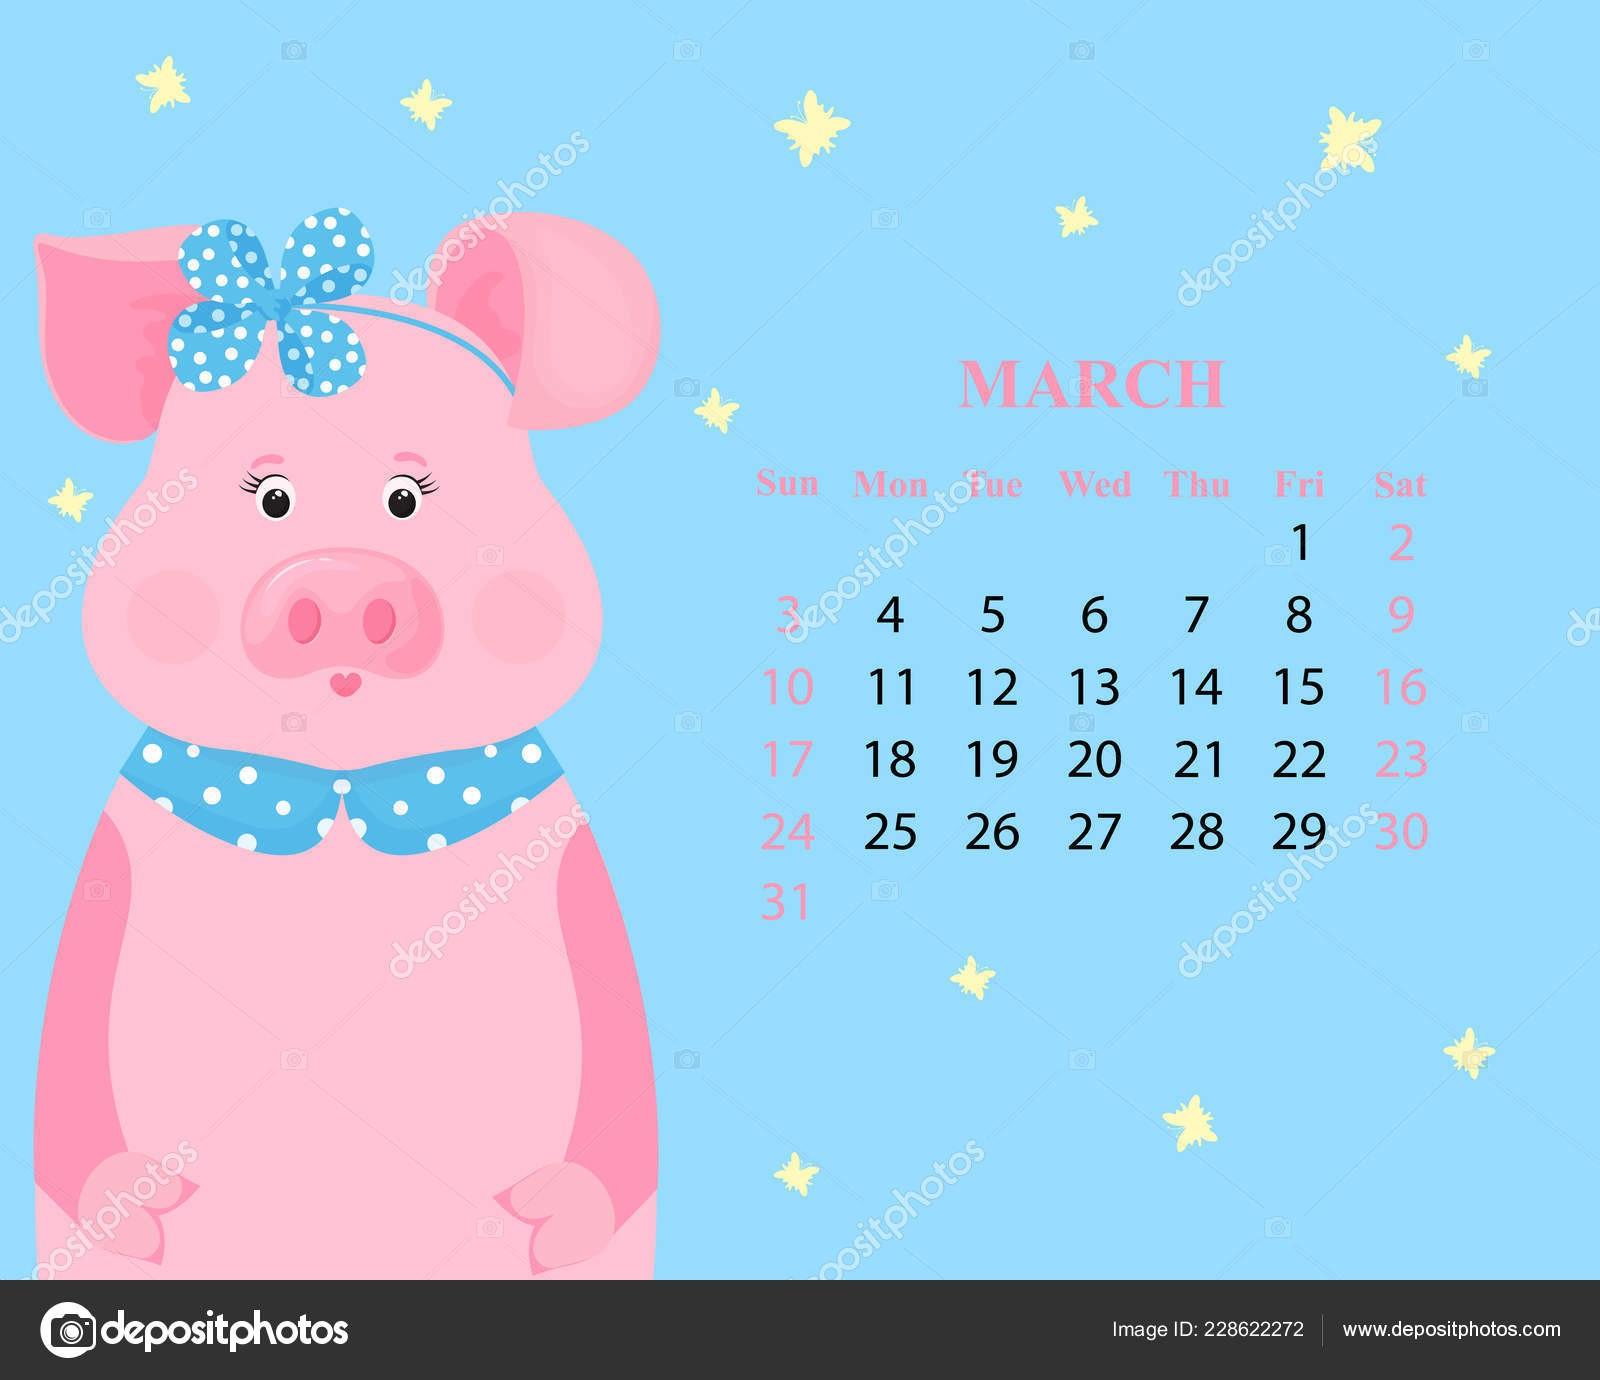 March Calendar 2019 Más Recientemente Liberado MěsÄn Kalendář Březen 2019 Roztomil½ Prase V Obruč S Lukem A Of March Calendar 2019 Mejores Y Más Novedosos 30 Day Calendar Template Awesome Calendar 1 April 2018 to 31 March